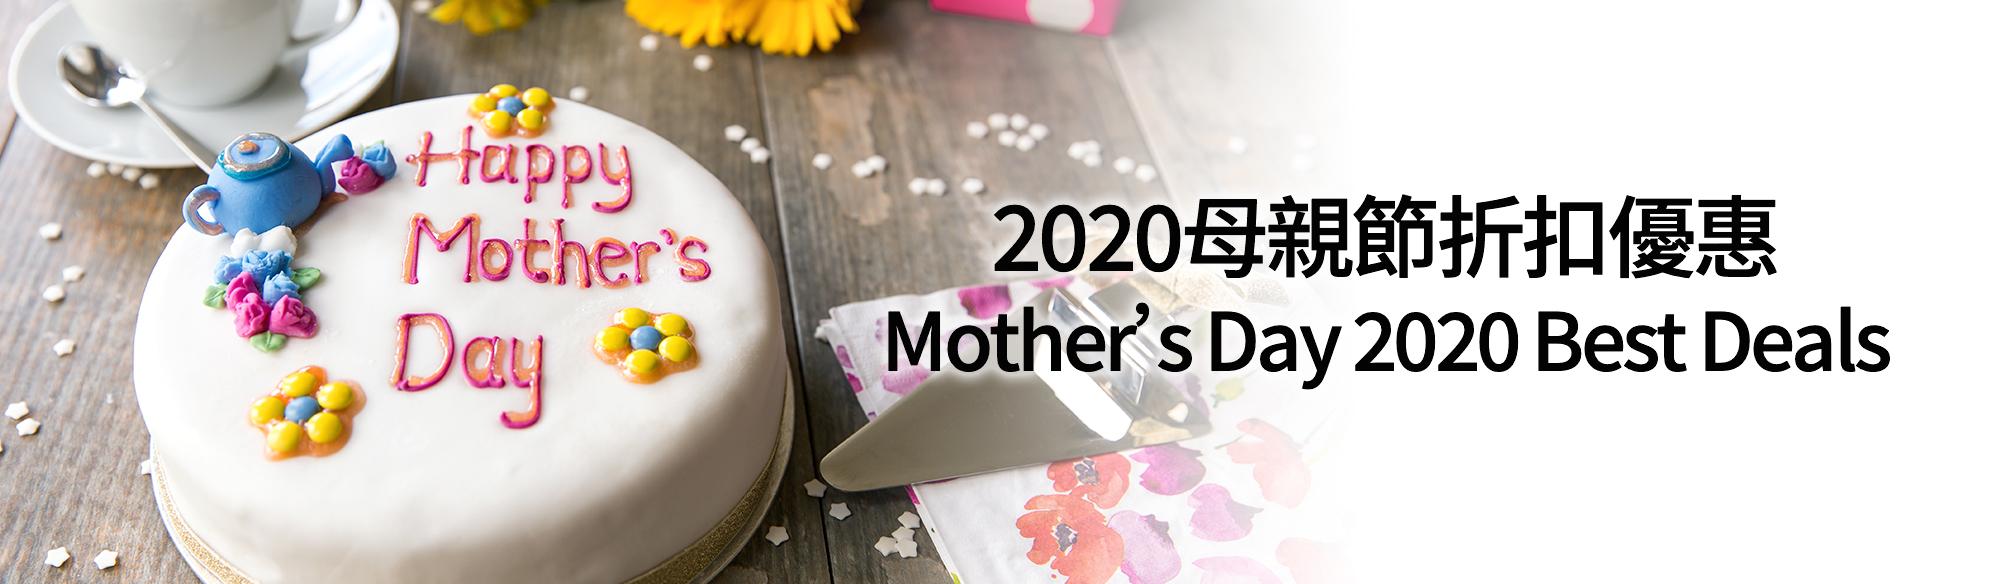 OkiBook_May_MotherDay_Banner_V1.jpg